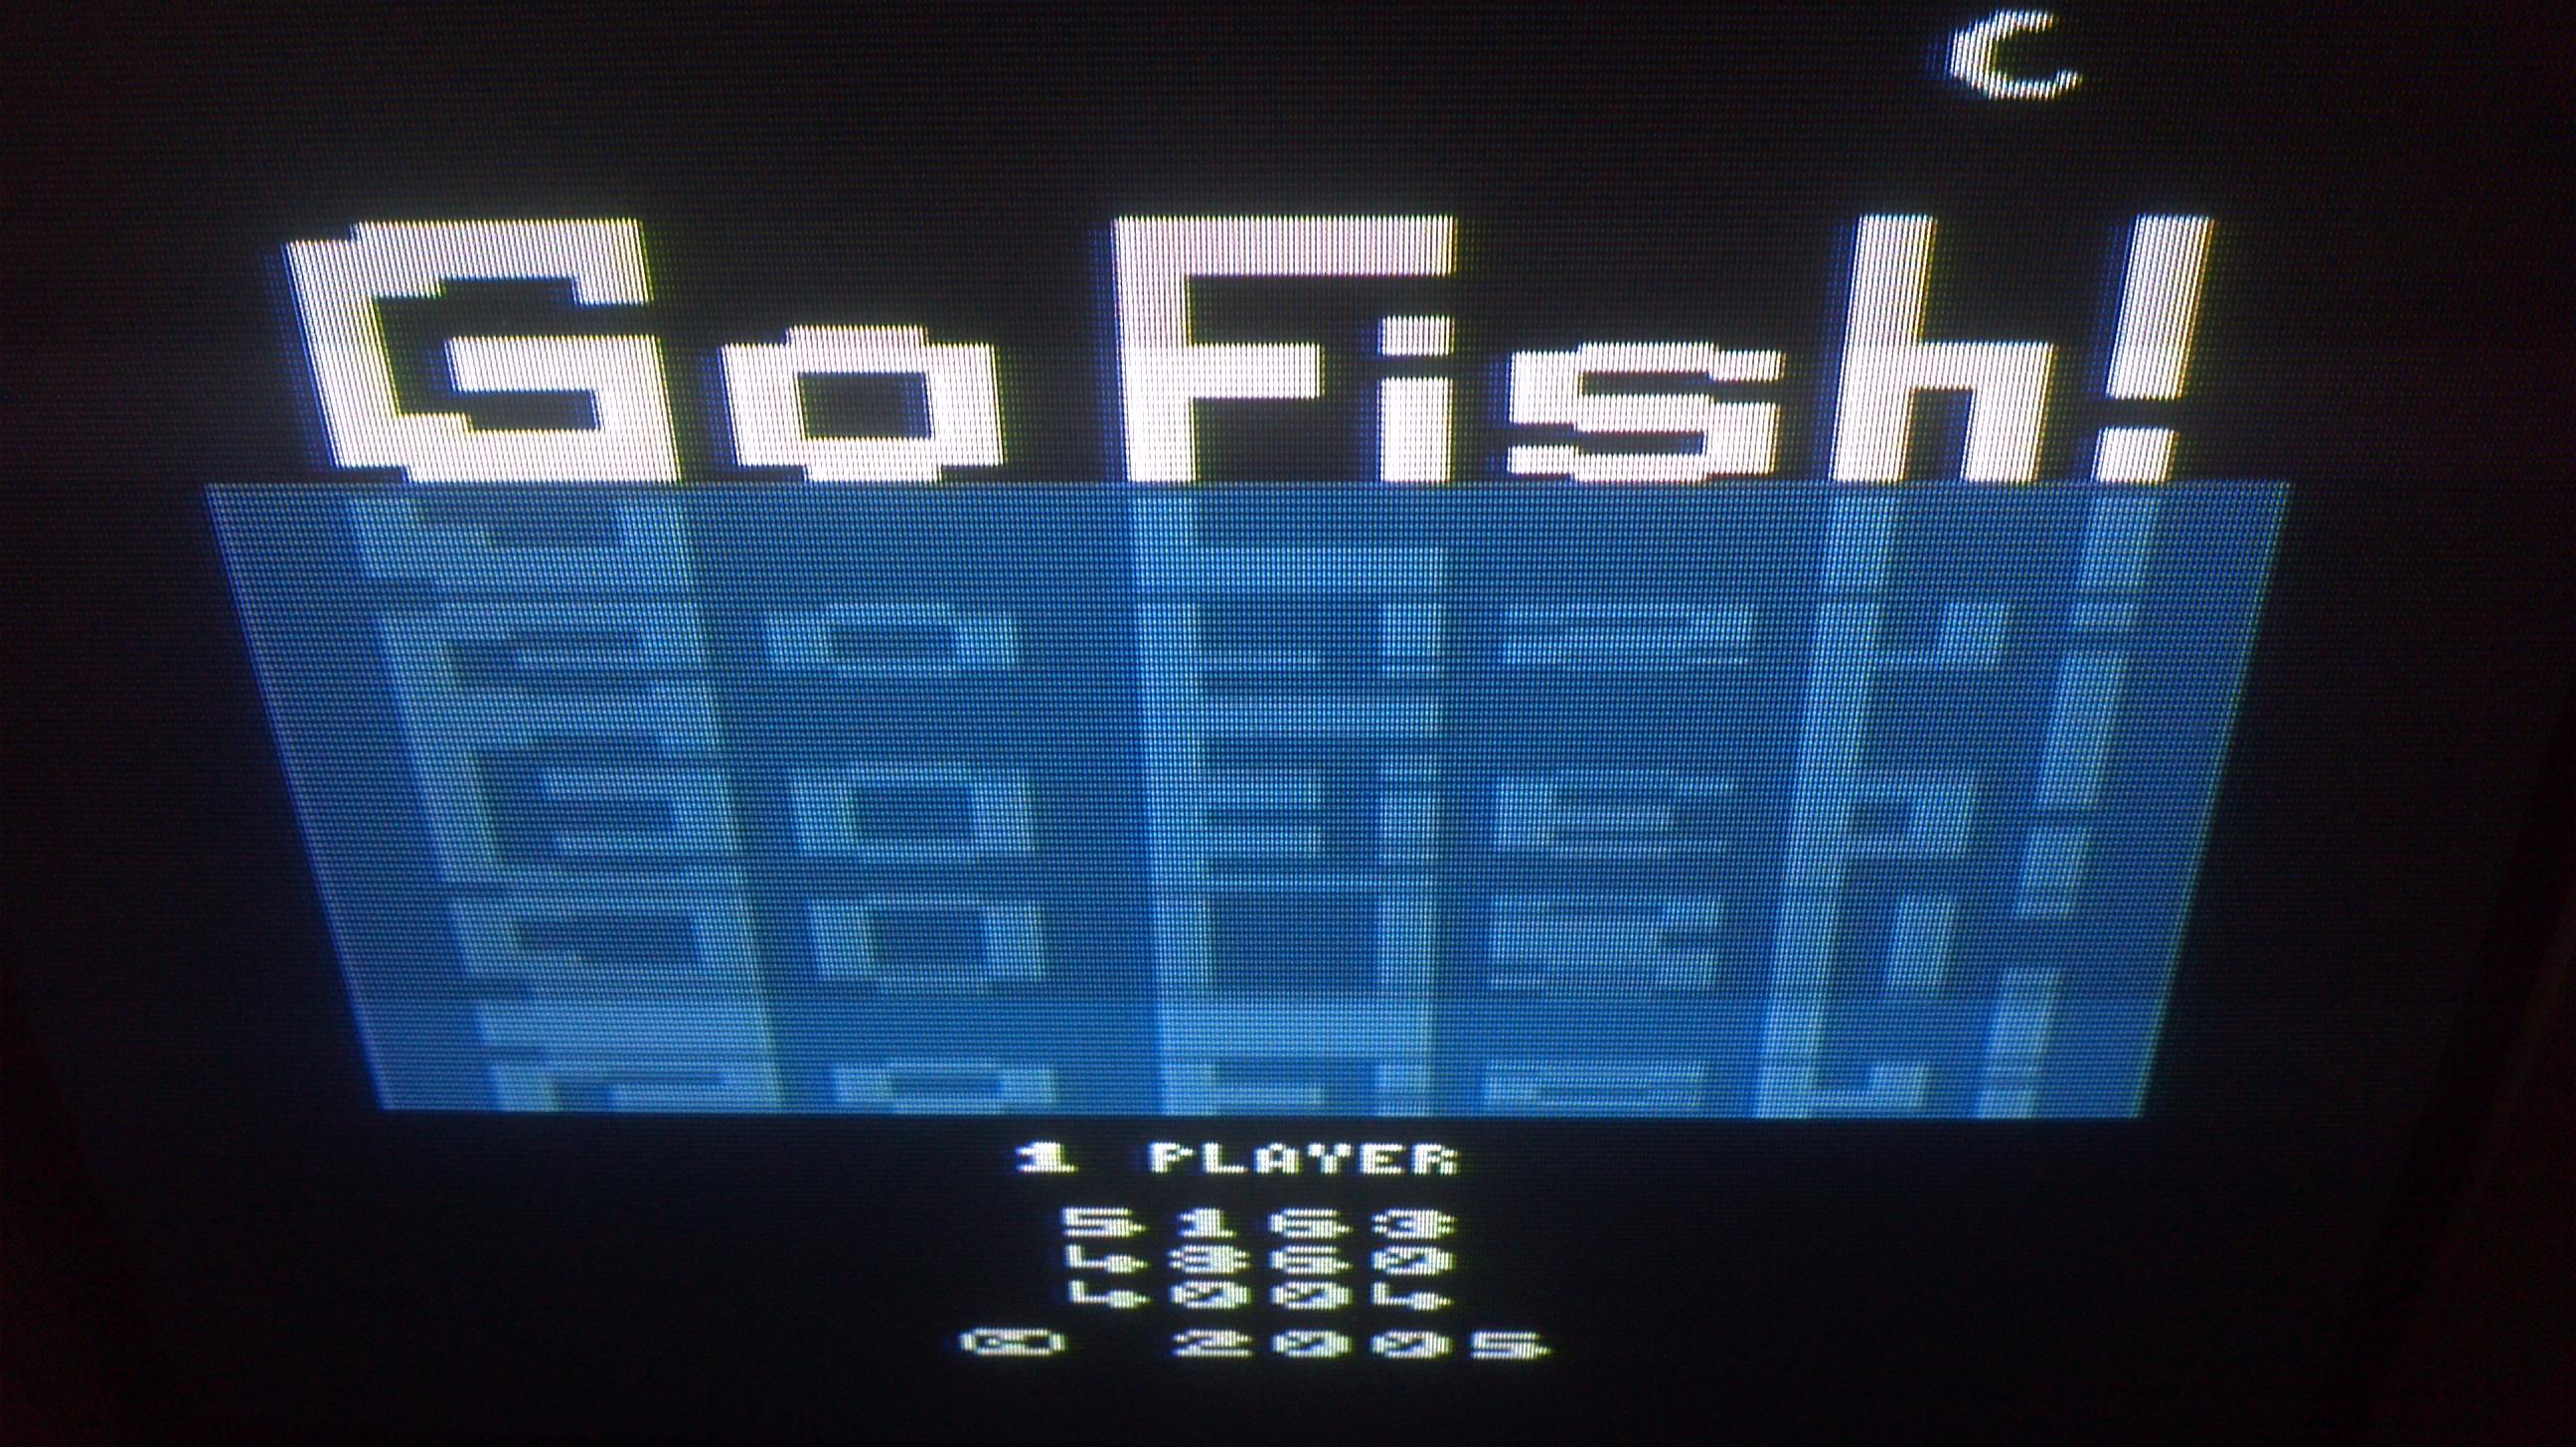 Liduario: Go Fish (Atari 2600 Novice/B) 5,163 points on 2014-05-12 08:58:44